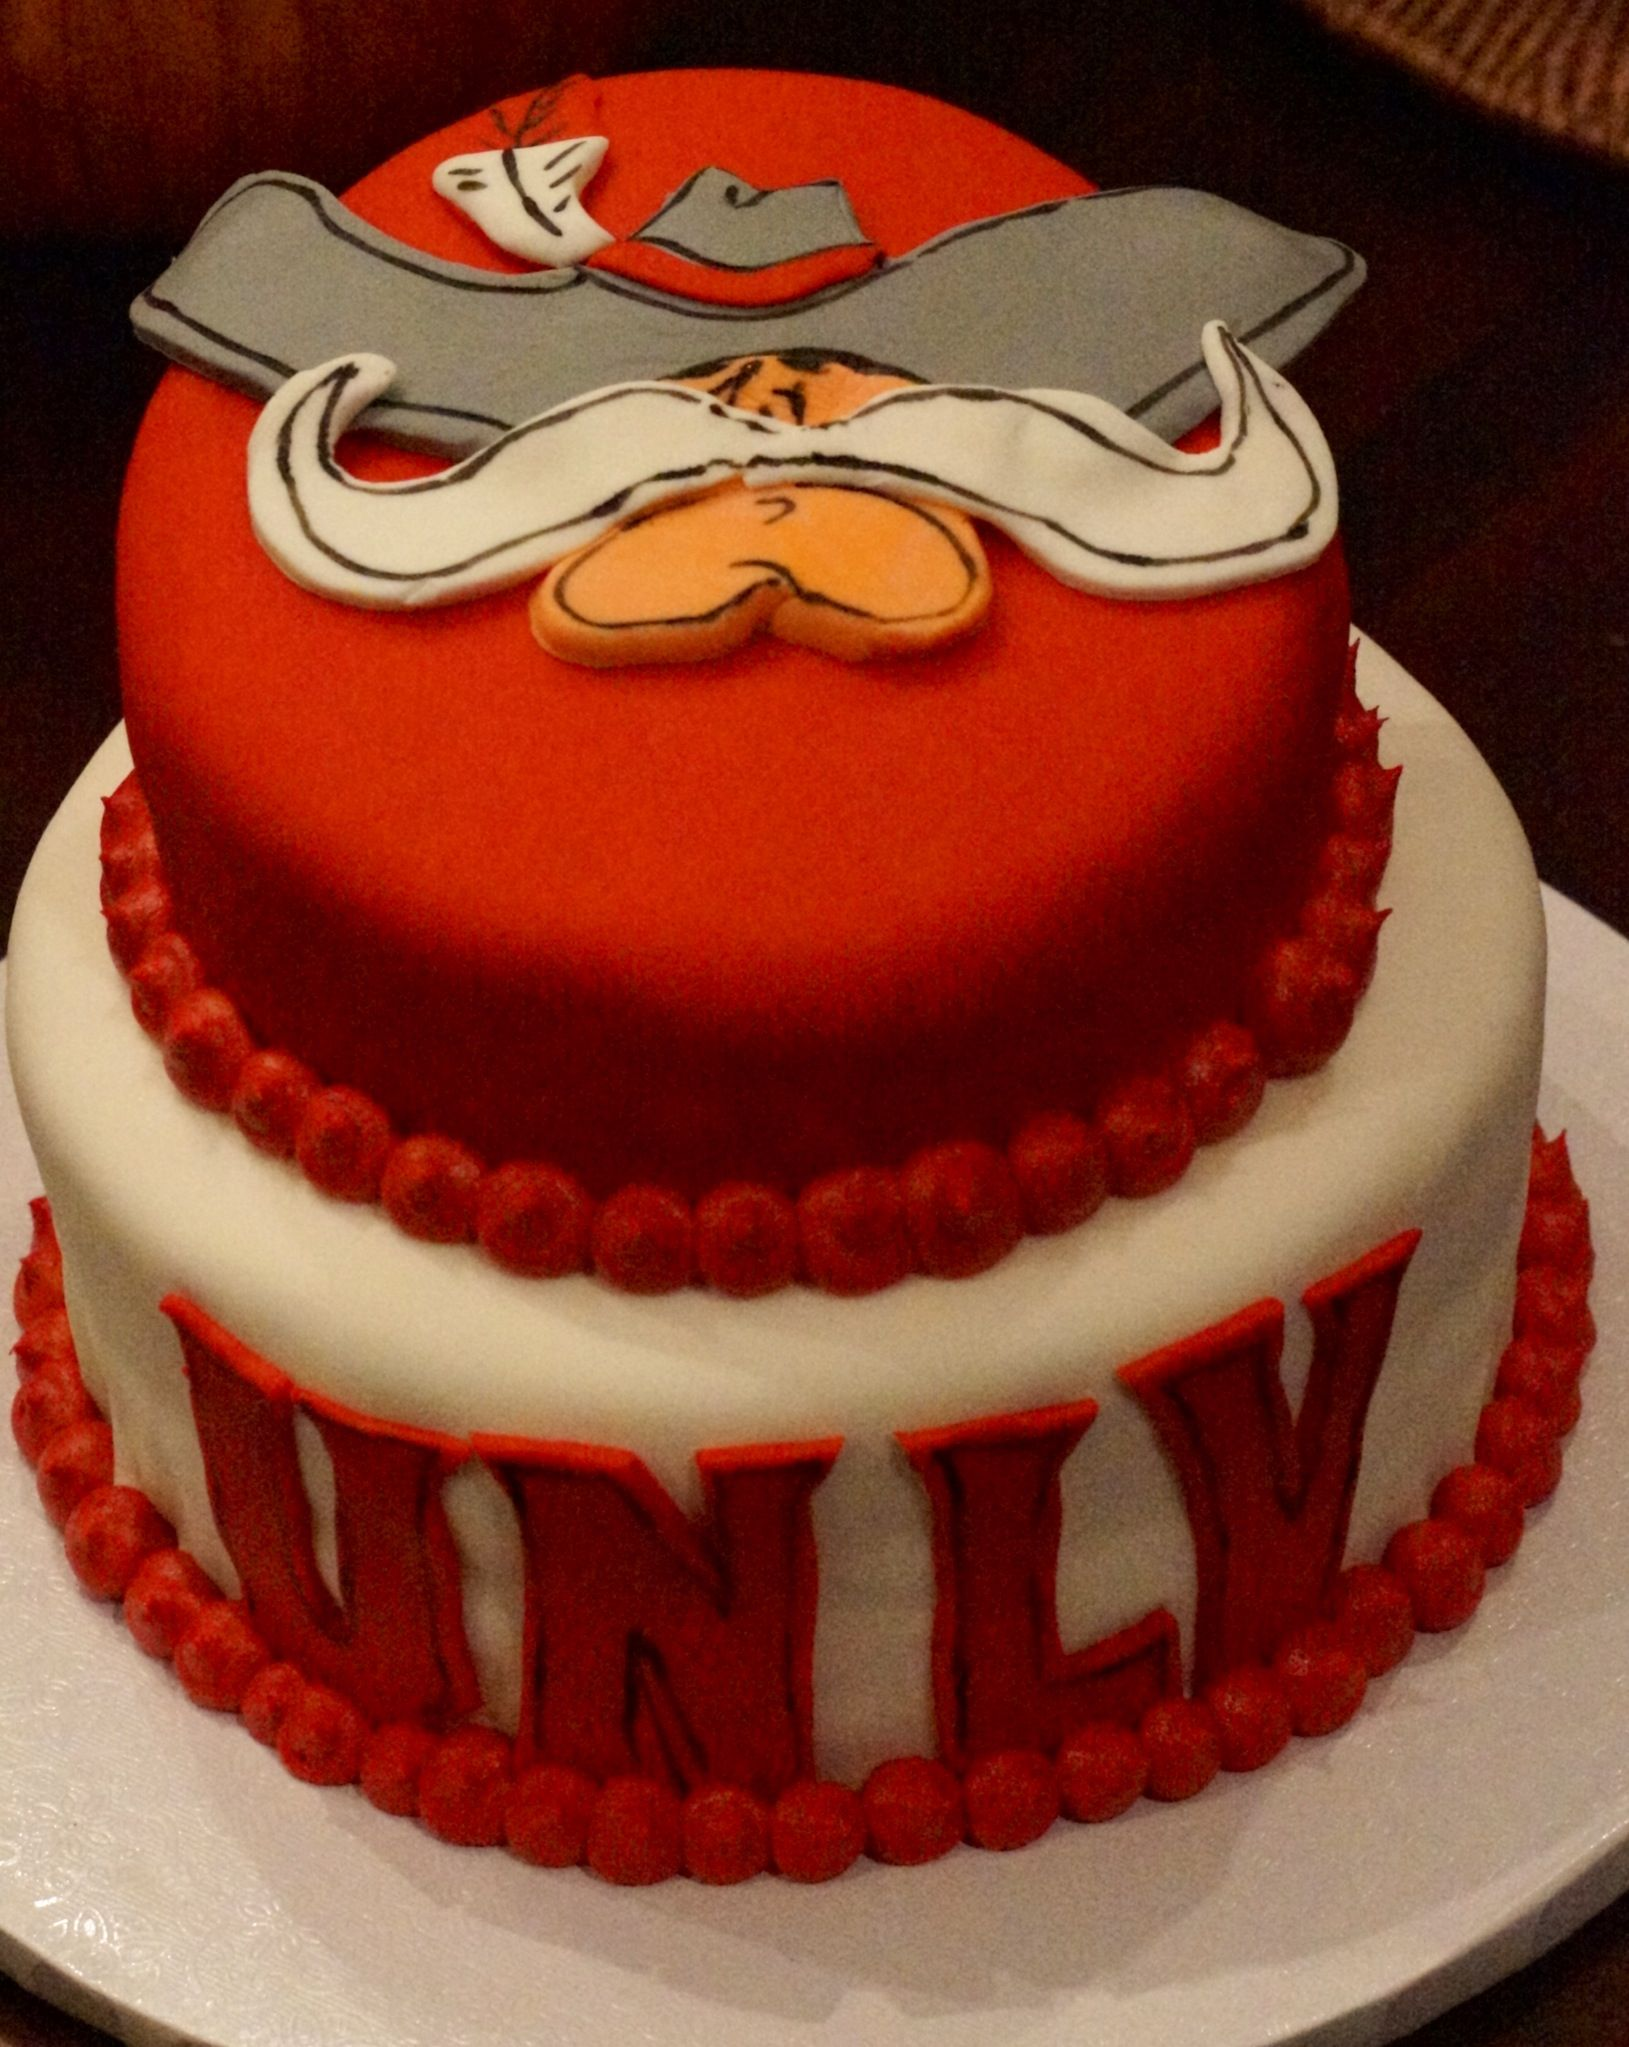 UNLV cake! Looks yummy! | All Things UNLV | Pinterest | Cake